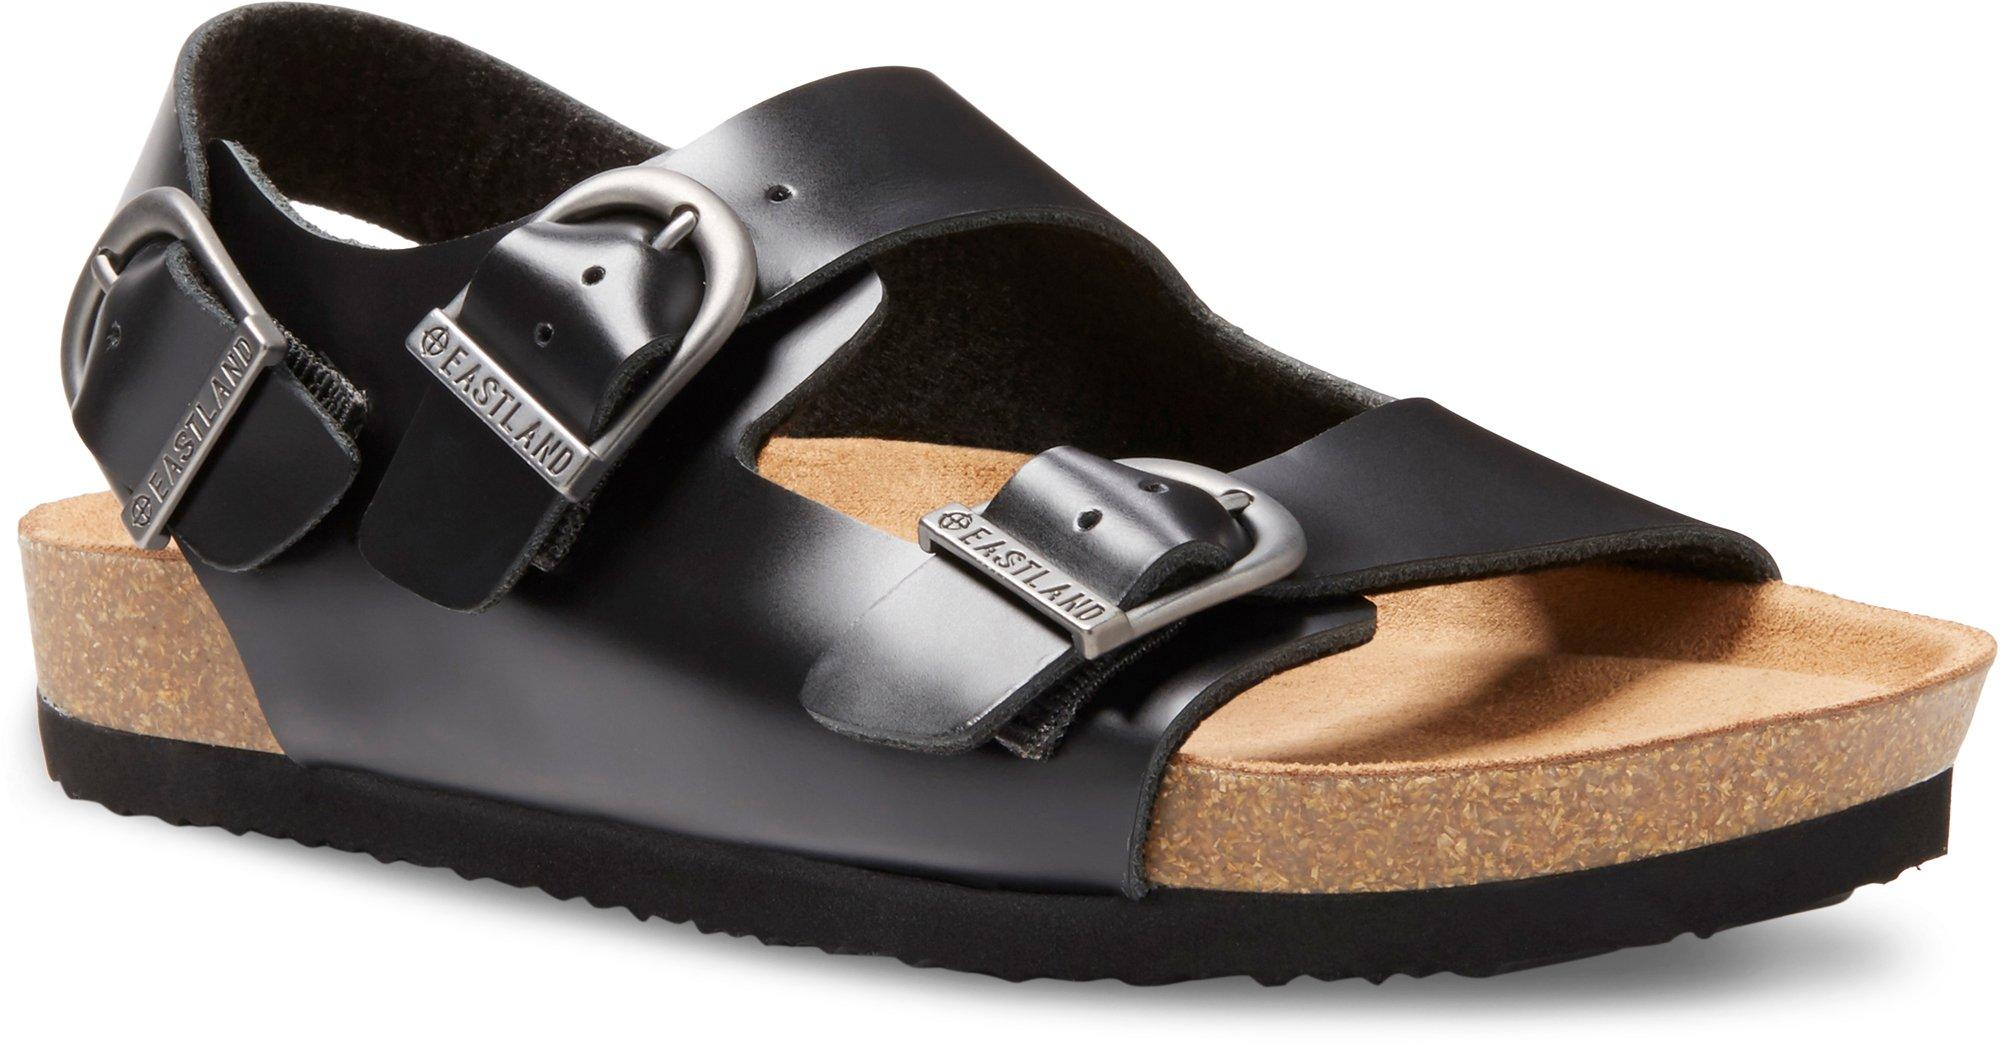 Details about  /Eastland Charlestown Women/'s Sandal